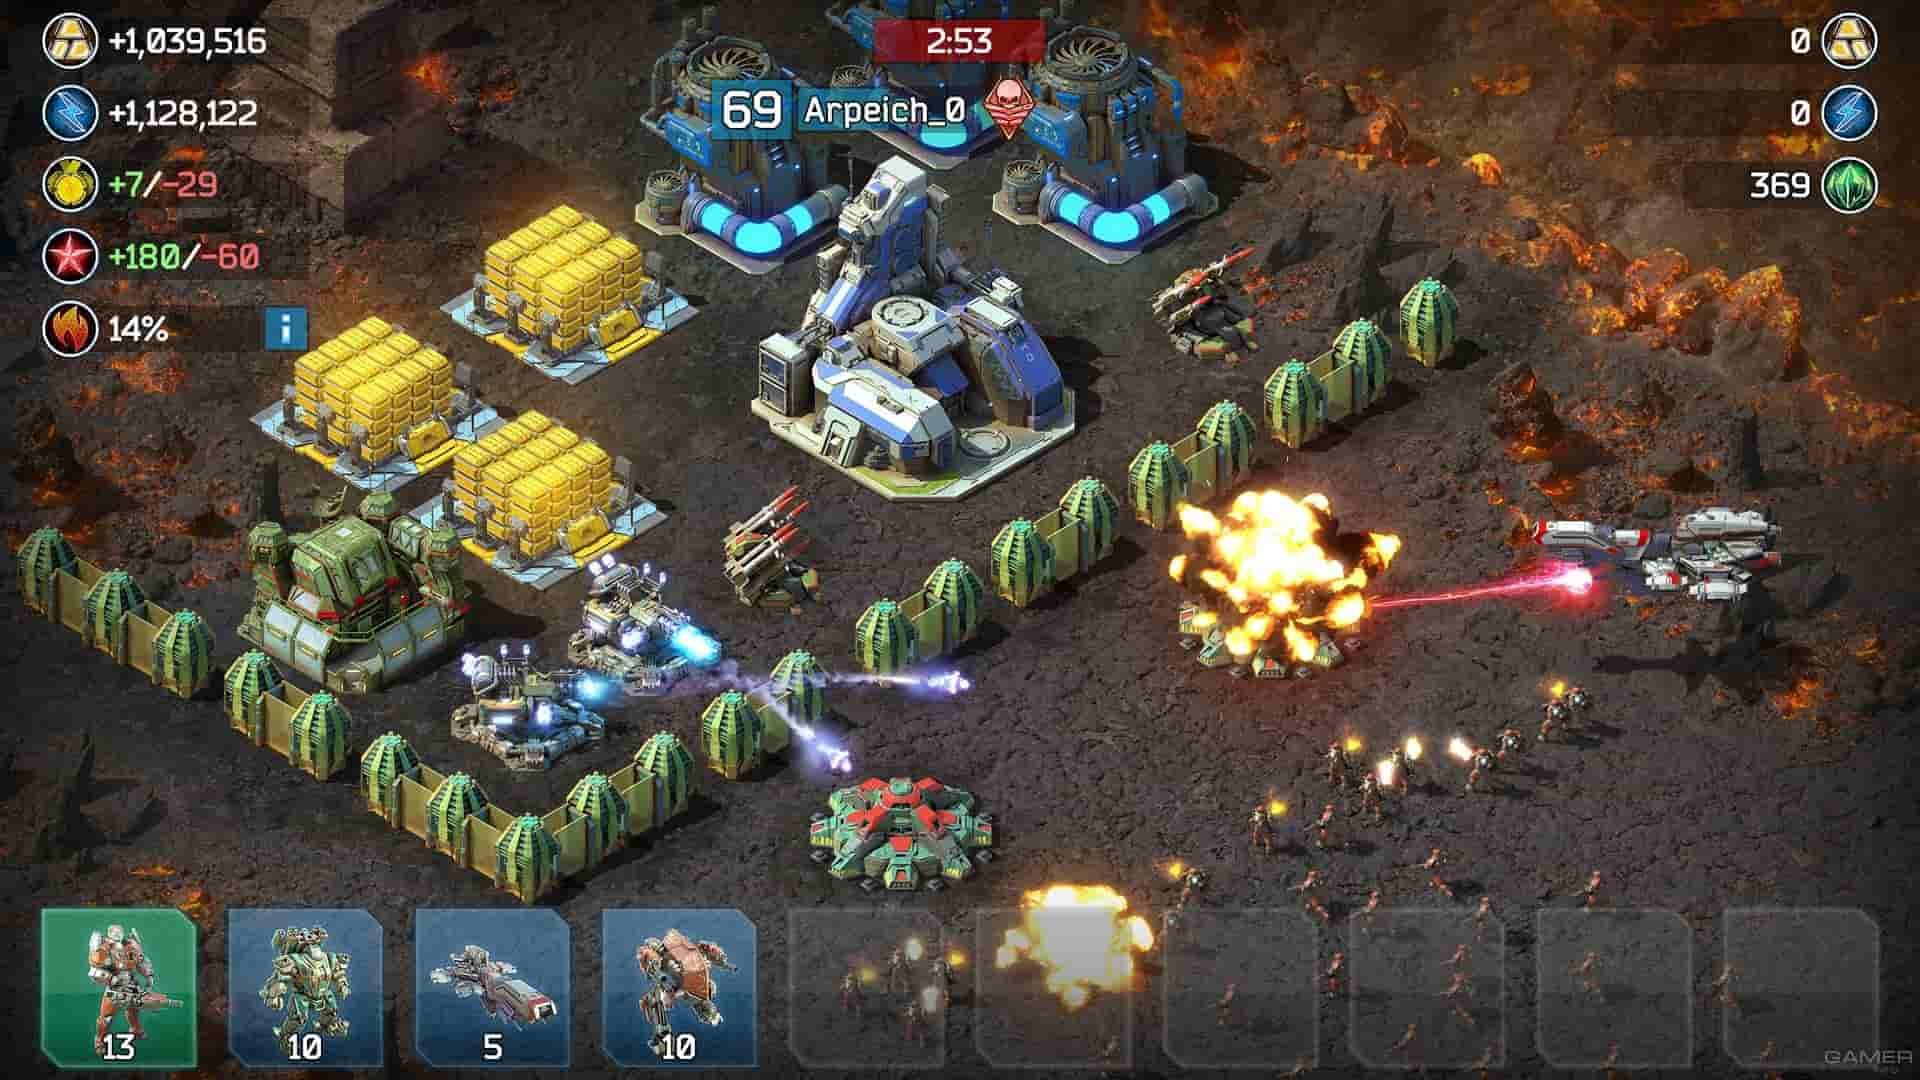 браузерная игра battle for the galaxy